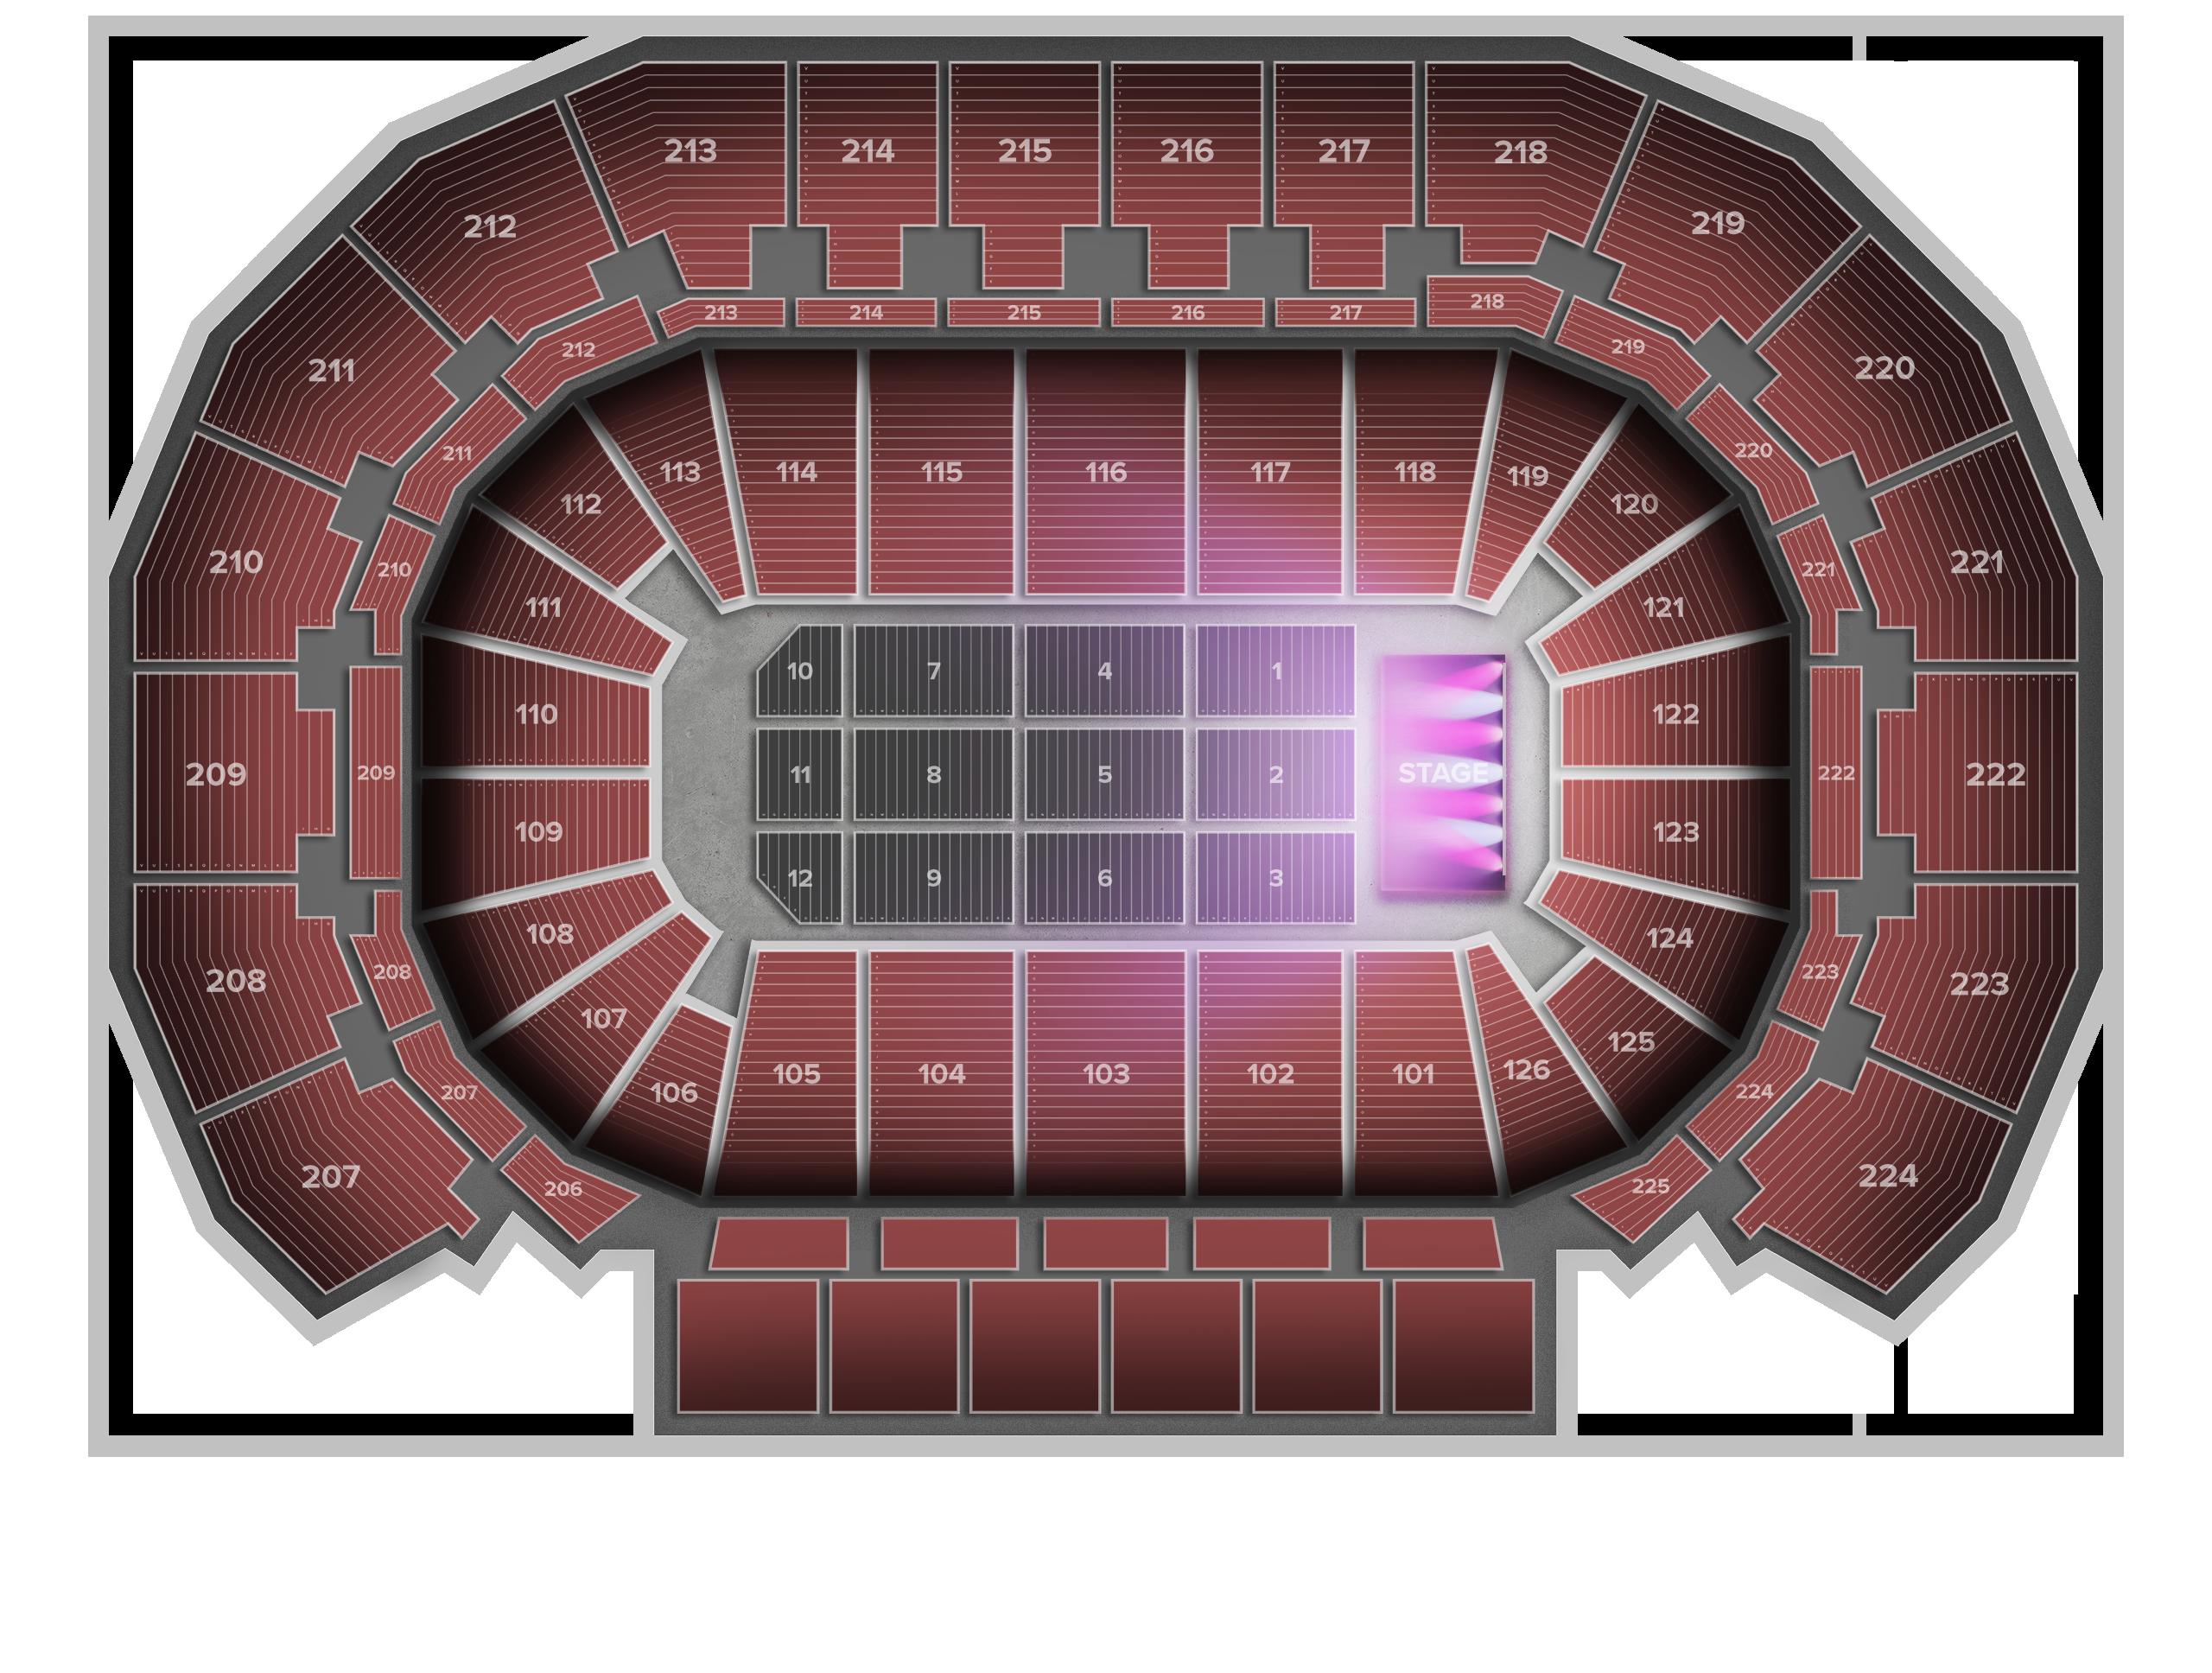 INTRUST Bank Arena Tickets